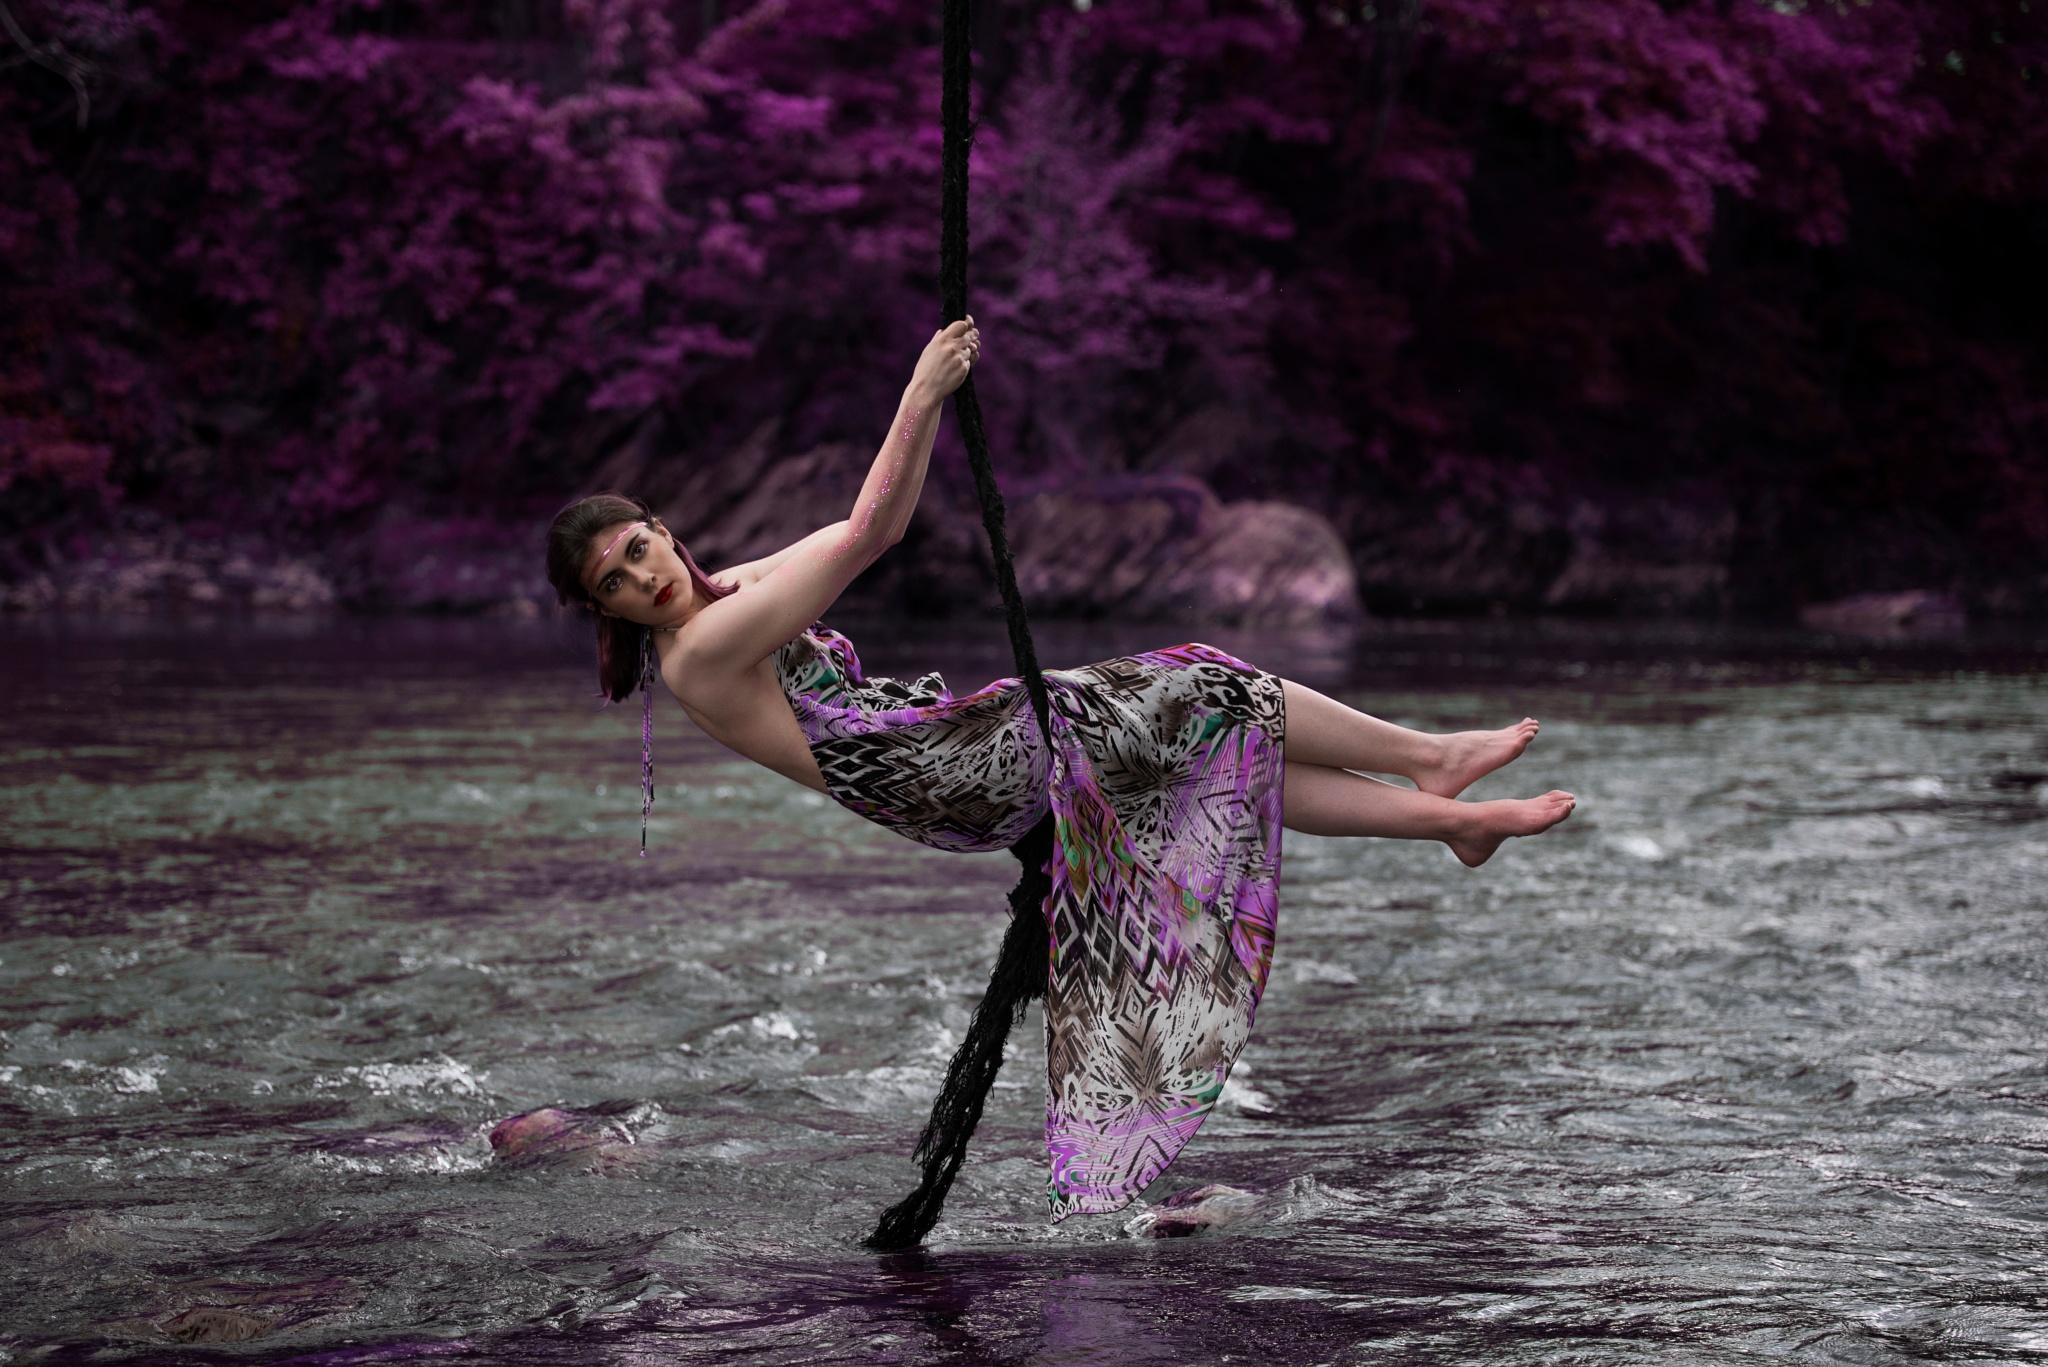 Purple Love by Kate Orzolek